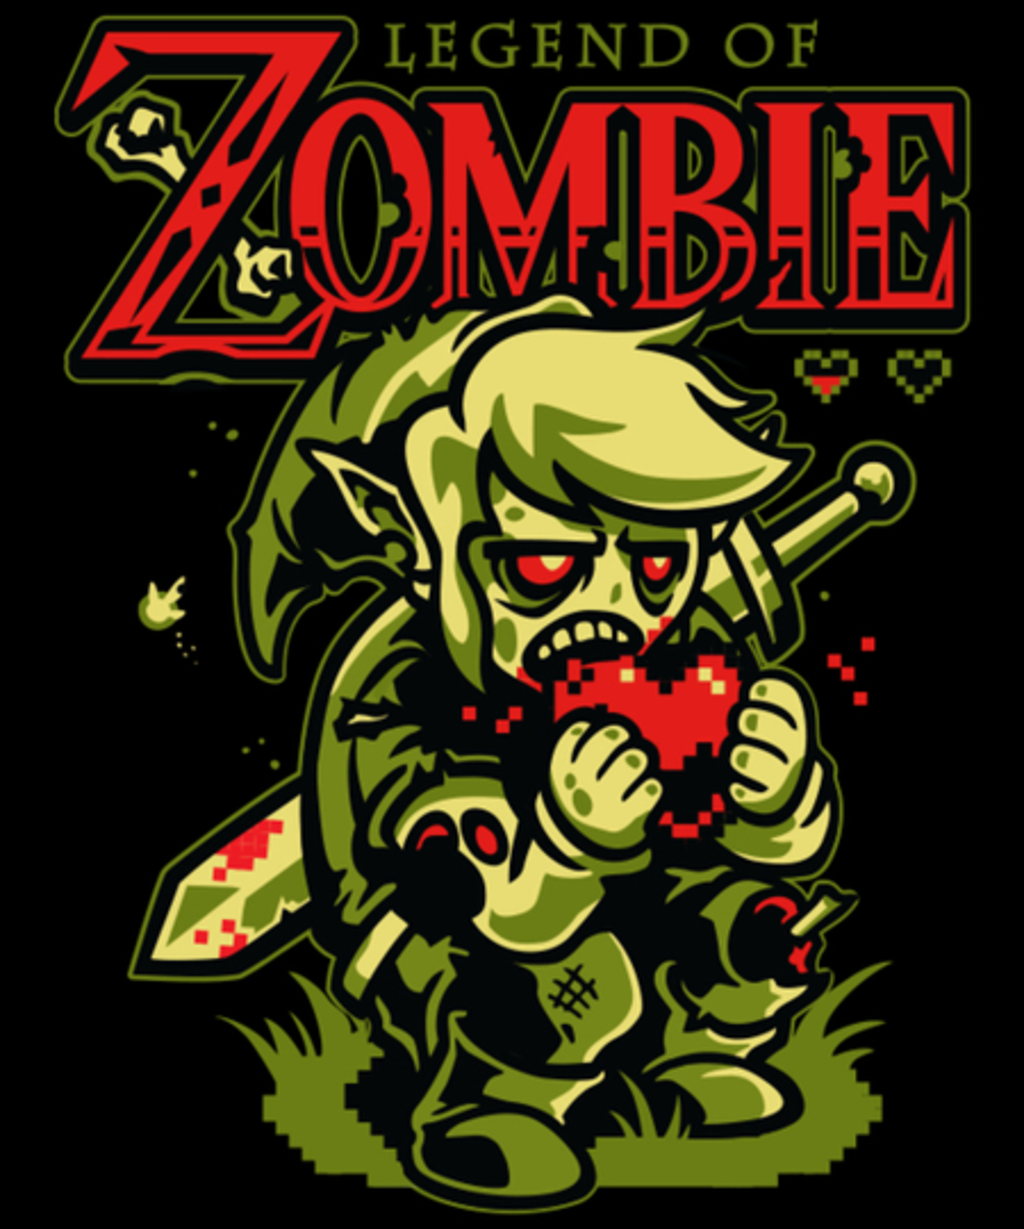 Qwertee: Legend of Zombie